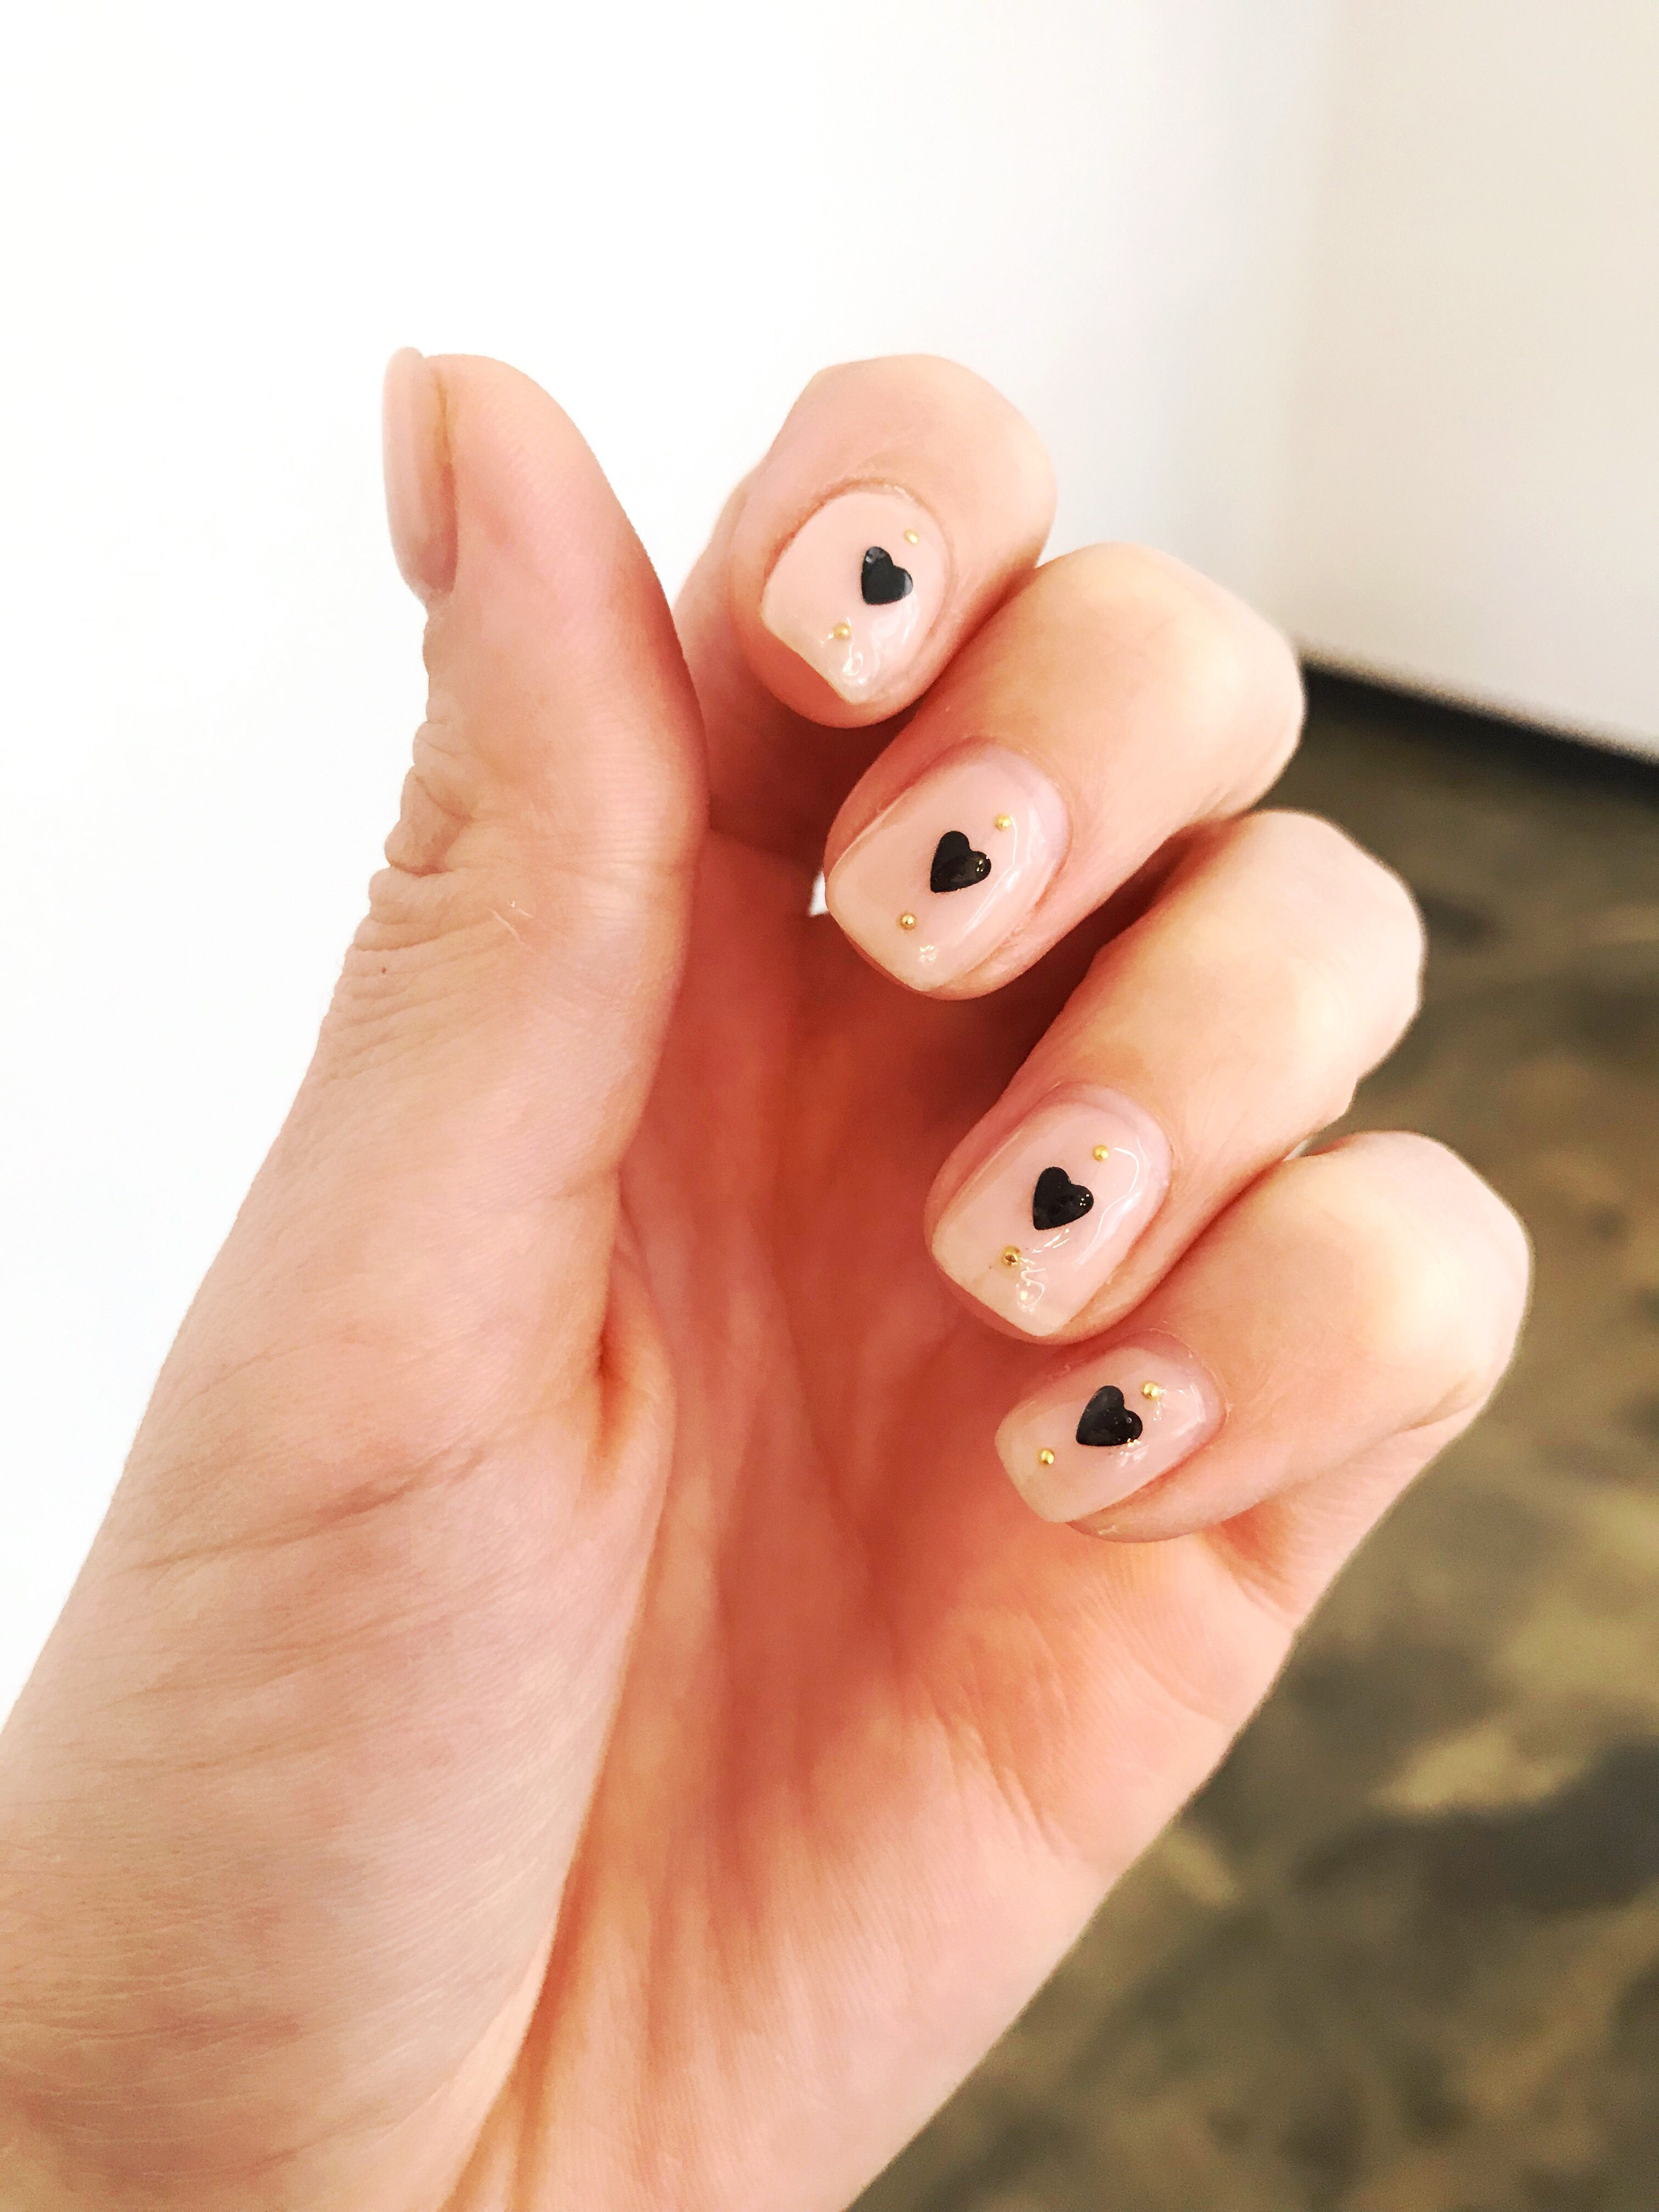 Clean And Simple Korean Manicure Koreannailart Hearts Nail Art Koreannaildesign Naildesign Nailart Simple Min Heart Nails Heart Nail Art Korean Nail Art